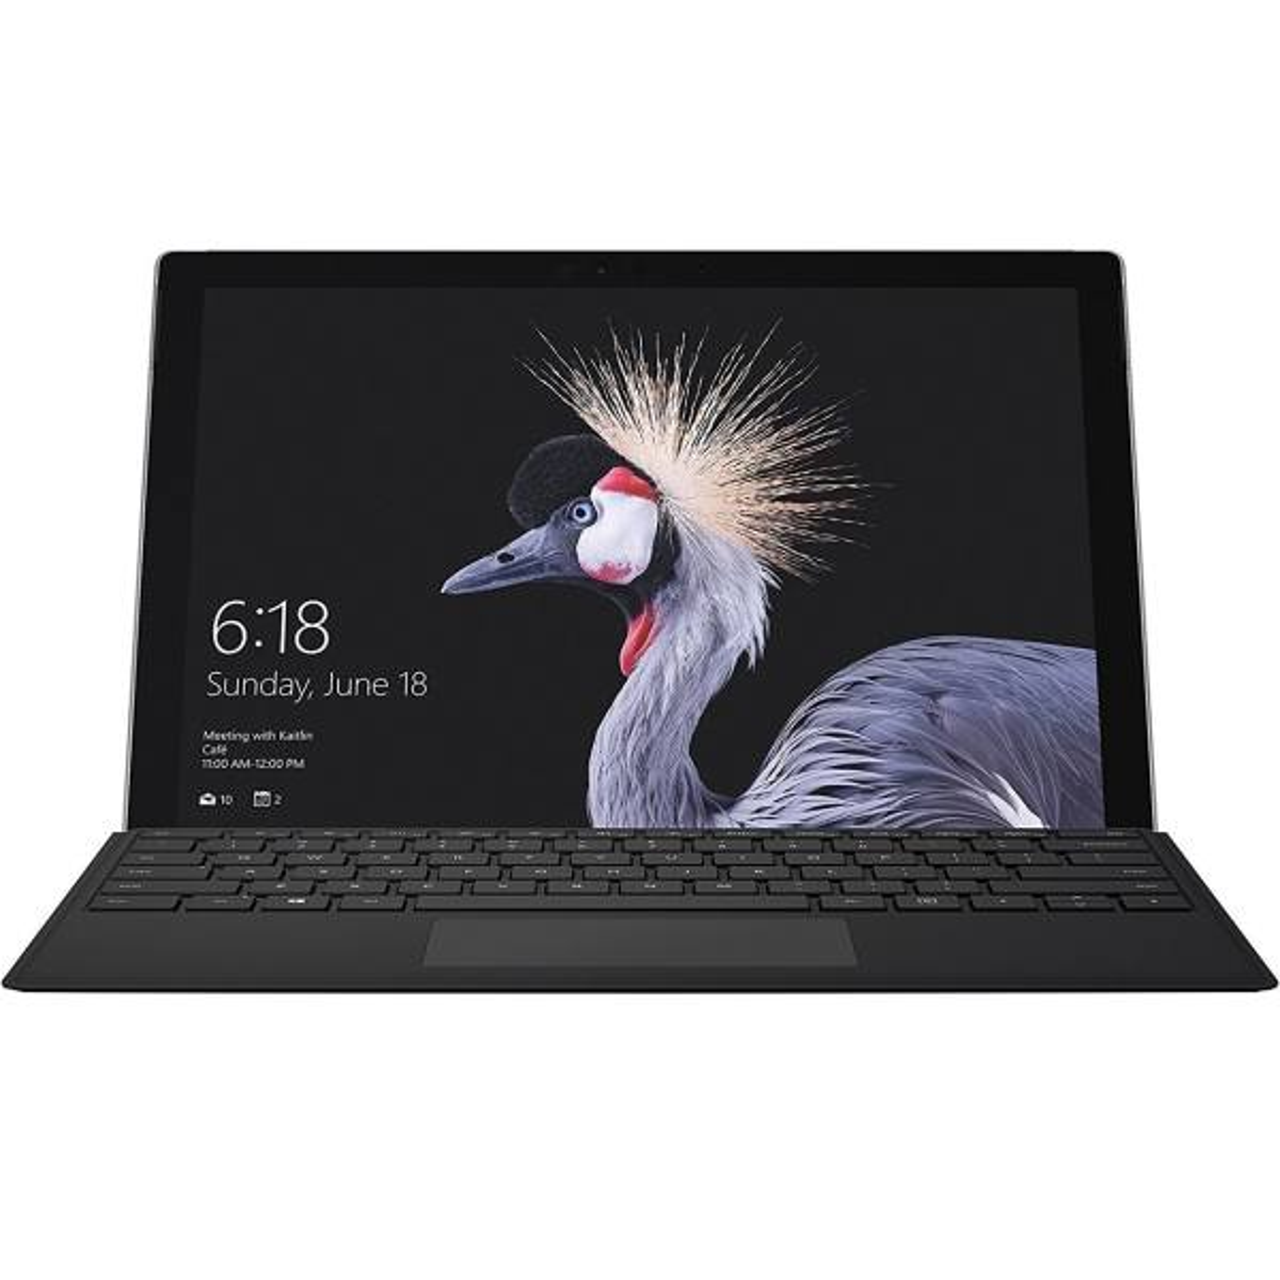 تبلت مایکروسافت سیم کارت خور مدل Surface Pro 2017 - B به همراه کیبورد مشکی مایکروسافت و کیف Golden Guard - ظرفیت 128 گیگابایت